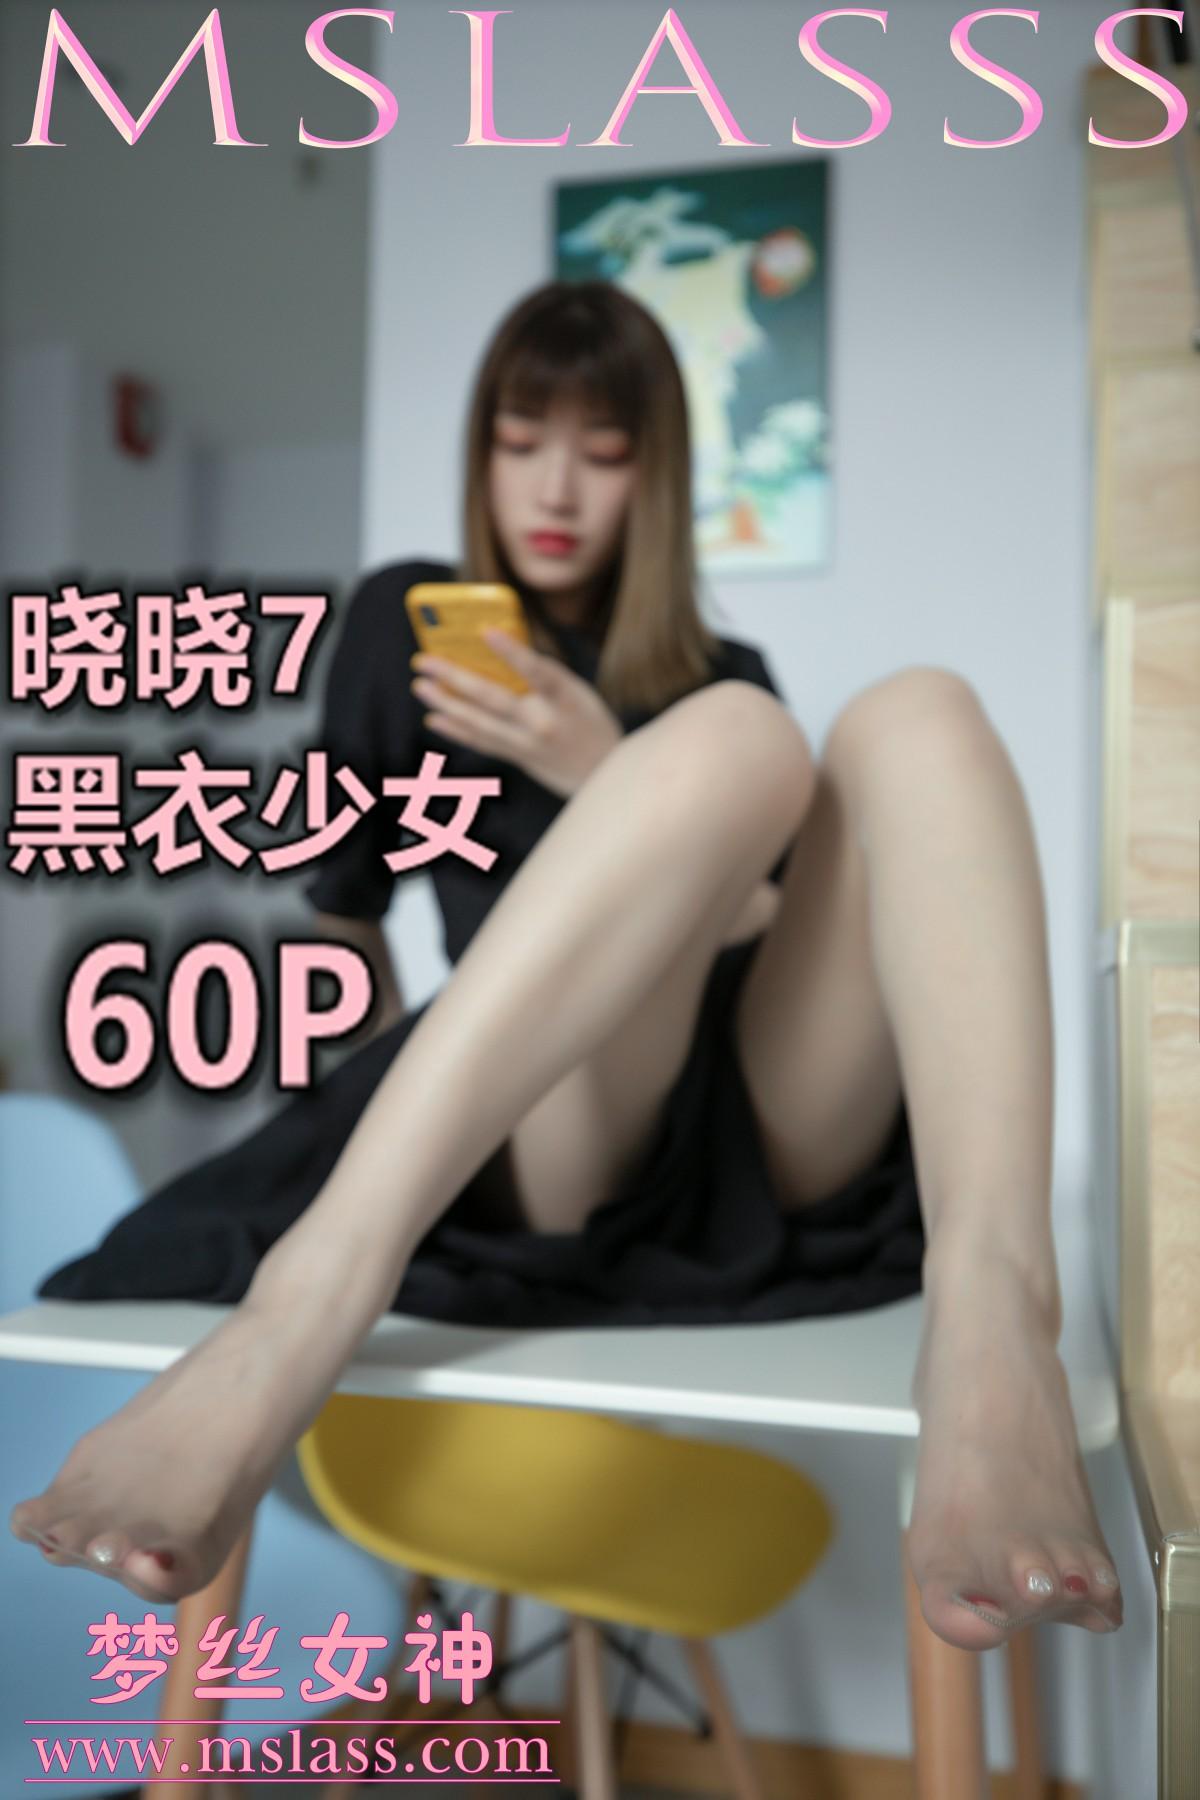 [MSLASS梦丝女神] 2020.06.18 晓晓6 黑衣少女 第1张